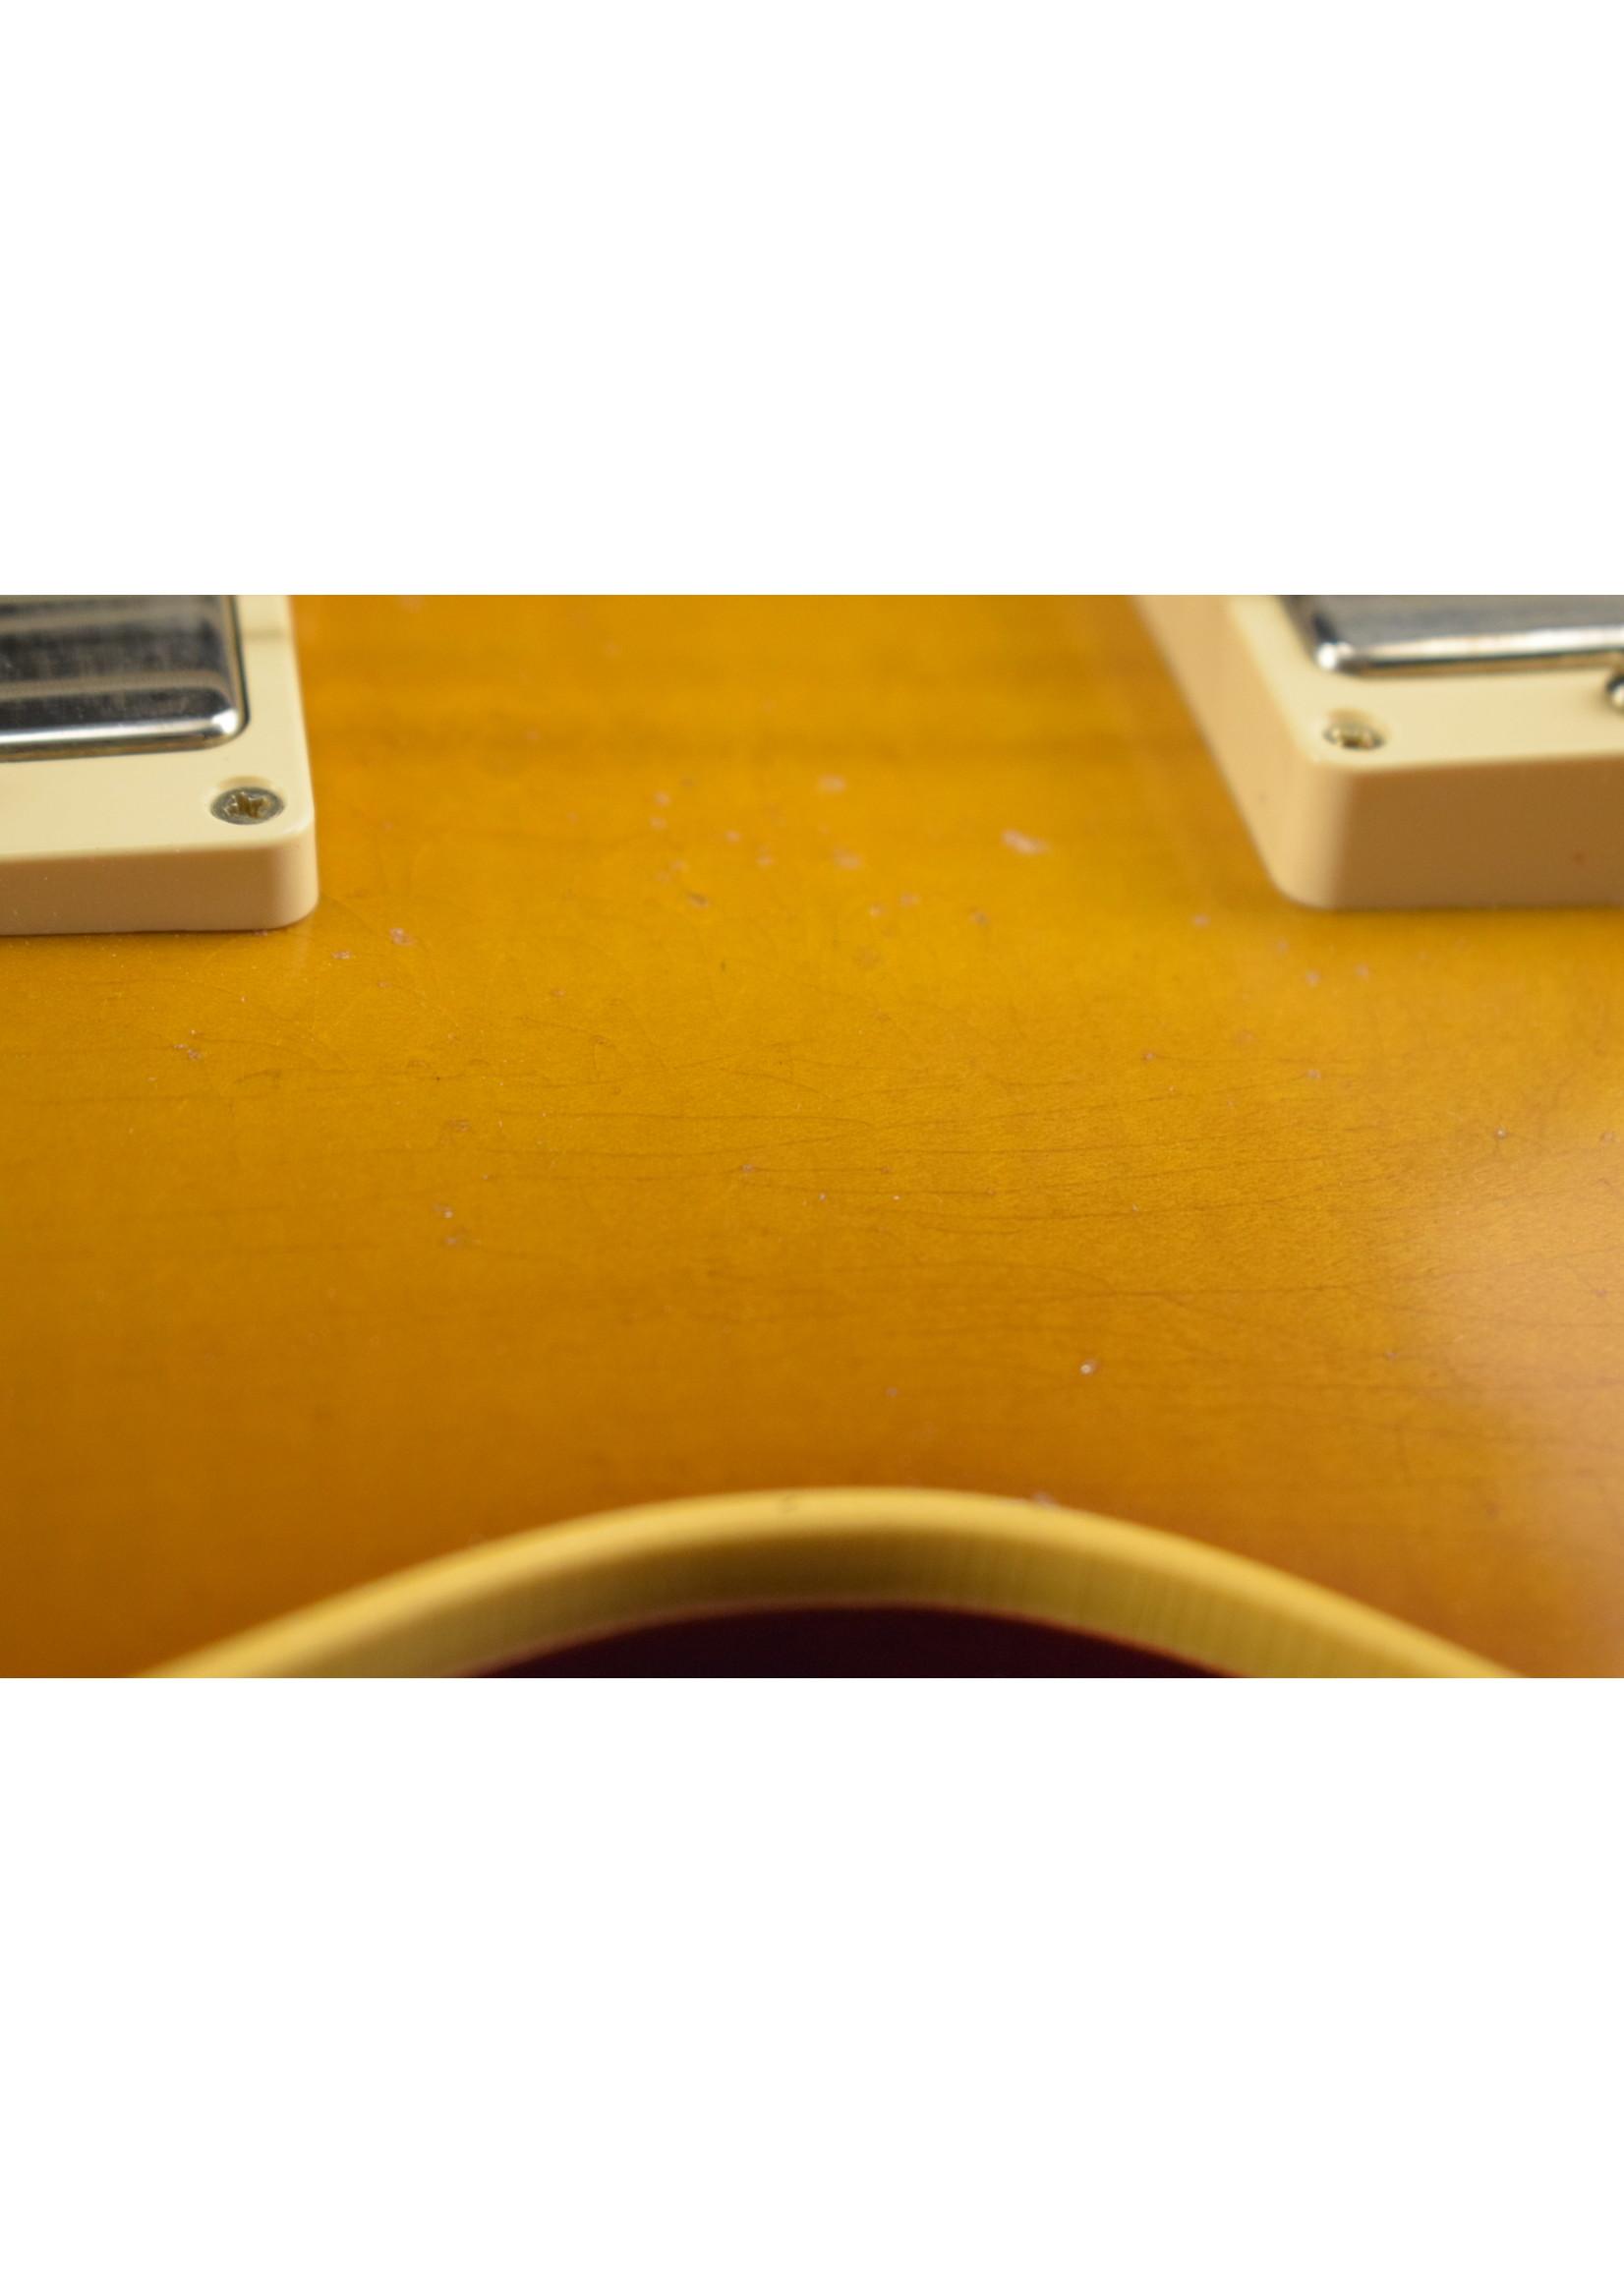 Gibson Gibson Murphy Lab 1959 Les Paul Standard Dirty Lemon Burst Light Aged